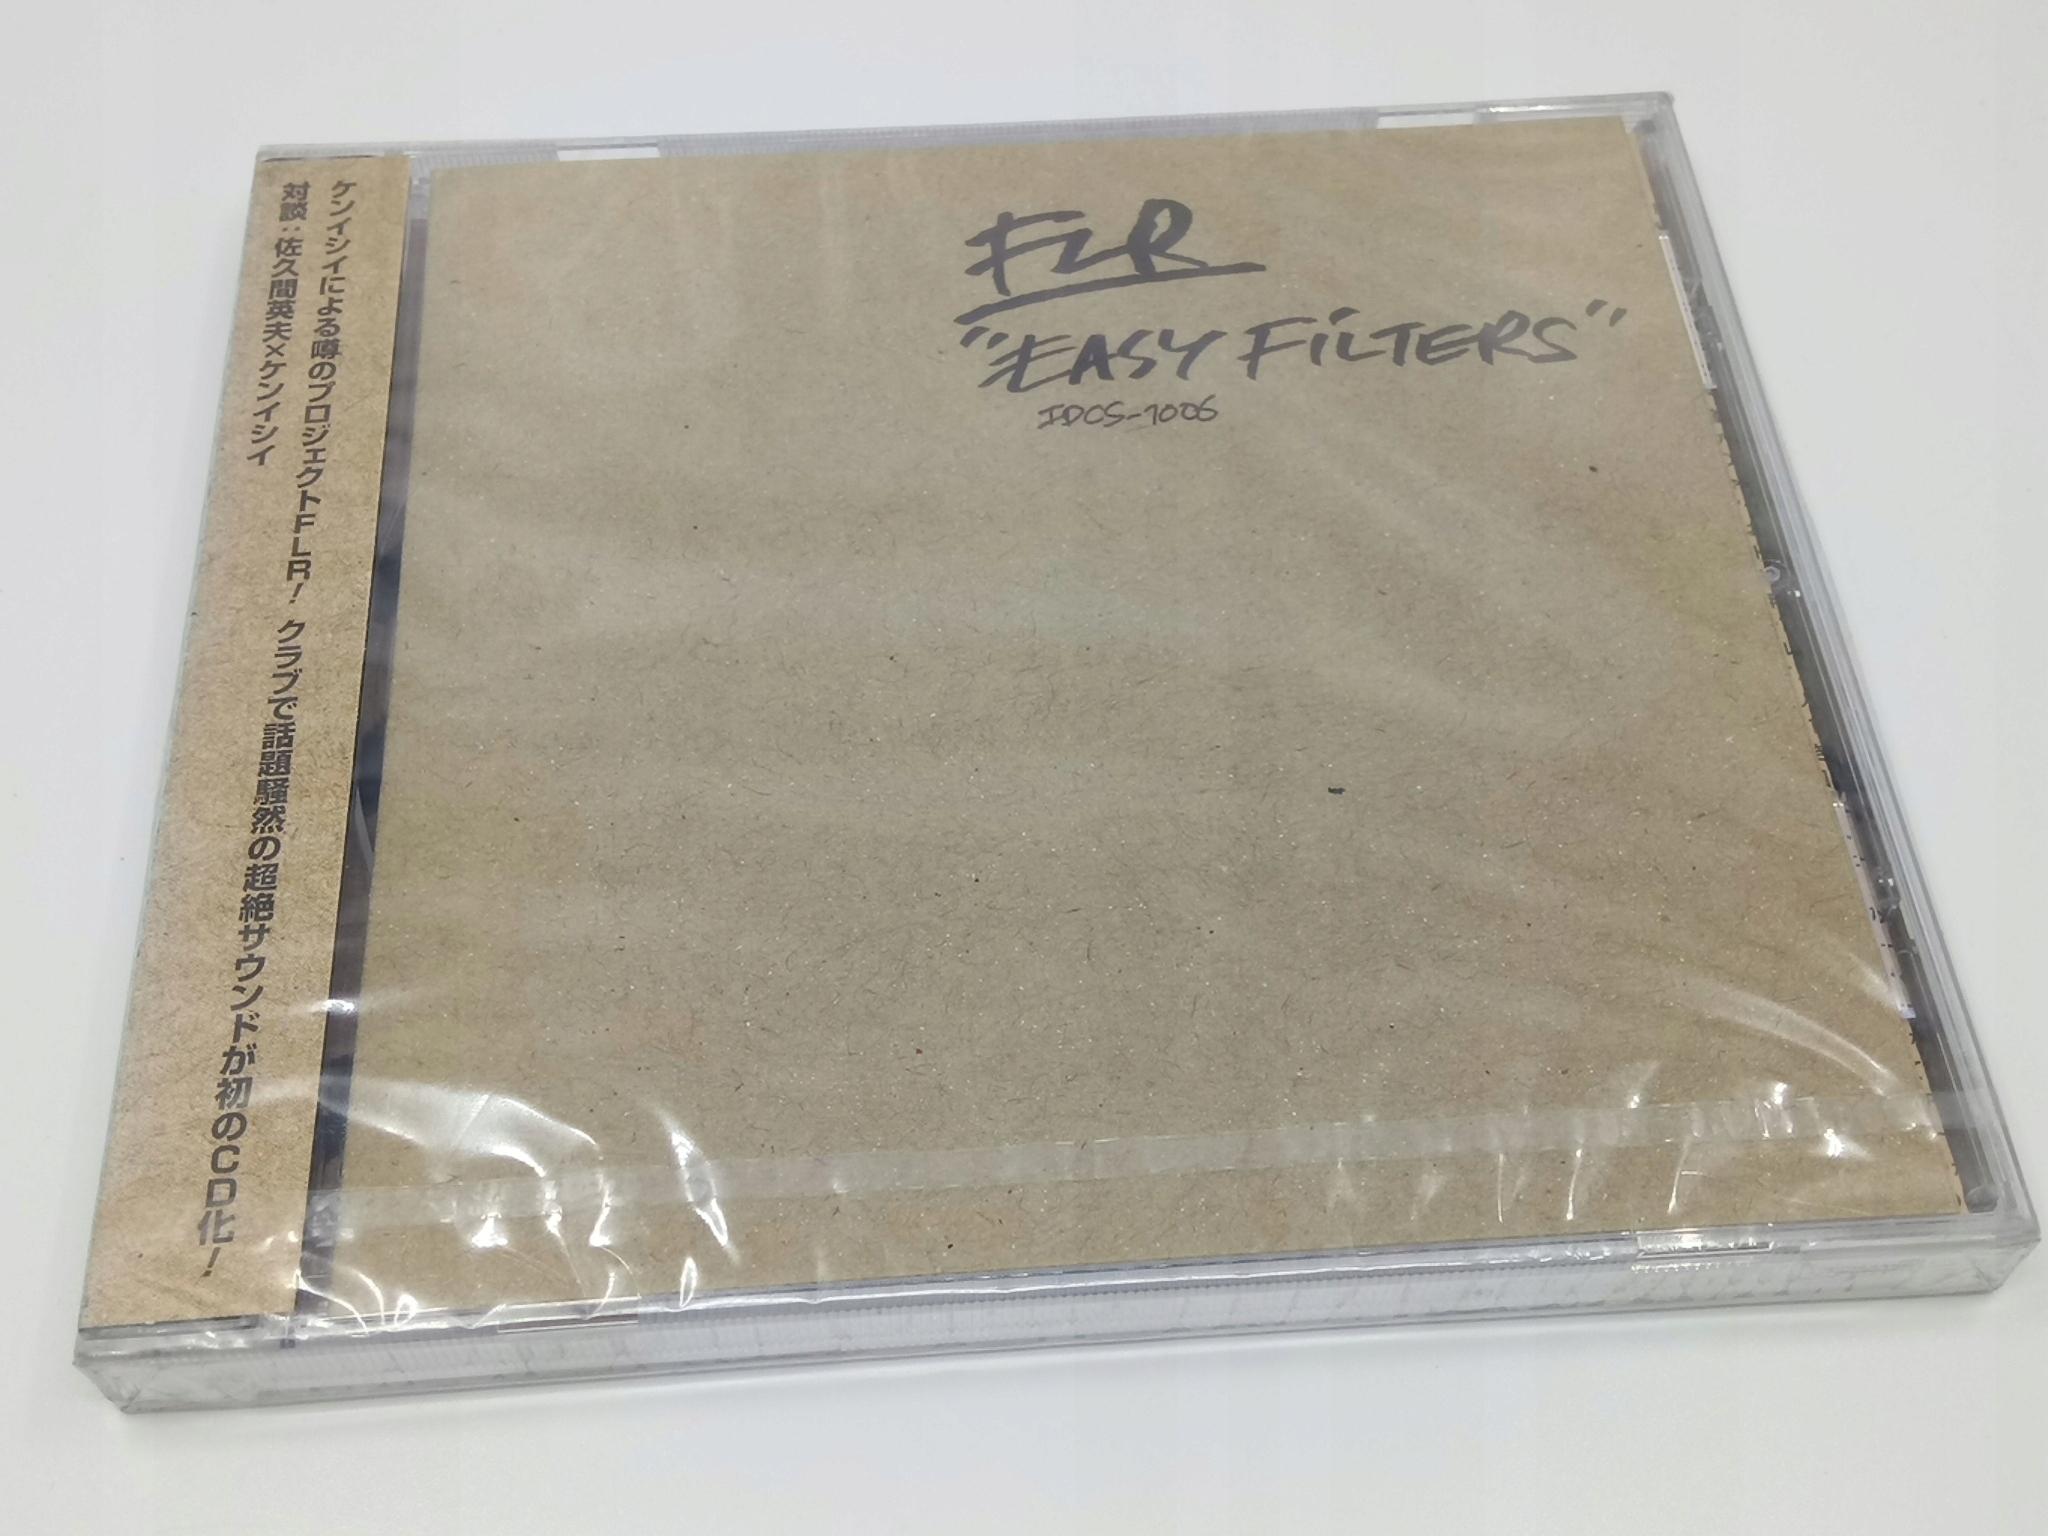 FLR - Easy Filters CD ALBUM JAPAN TECHNO